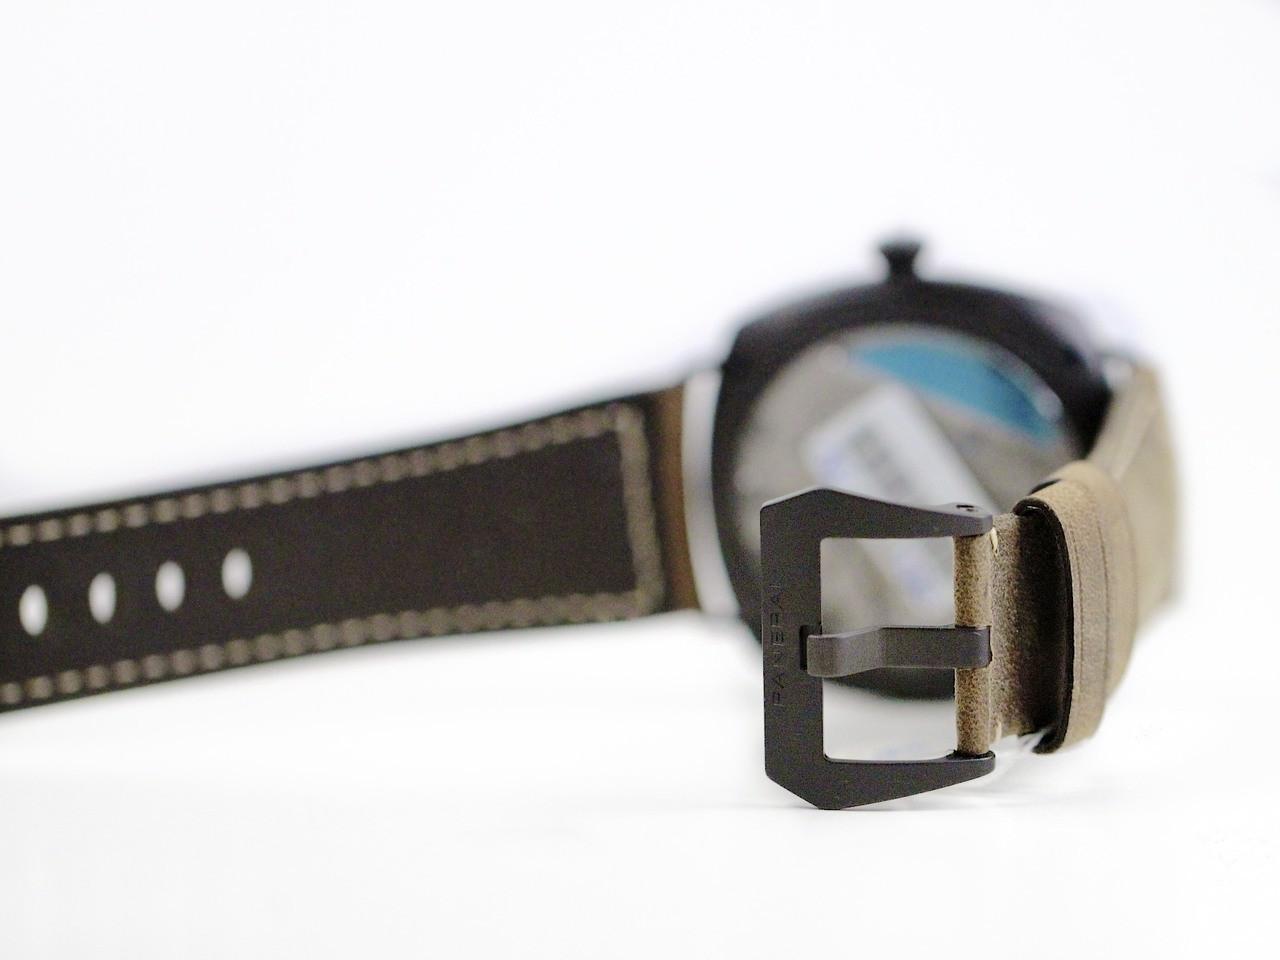 Tang Buckle - New Panerai Watch - Radiomir Composite 3 Days PAM 504 www.Legendoftime.com - Chicago Watch Center